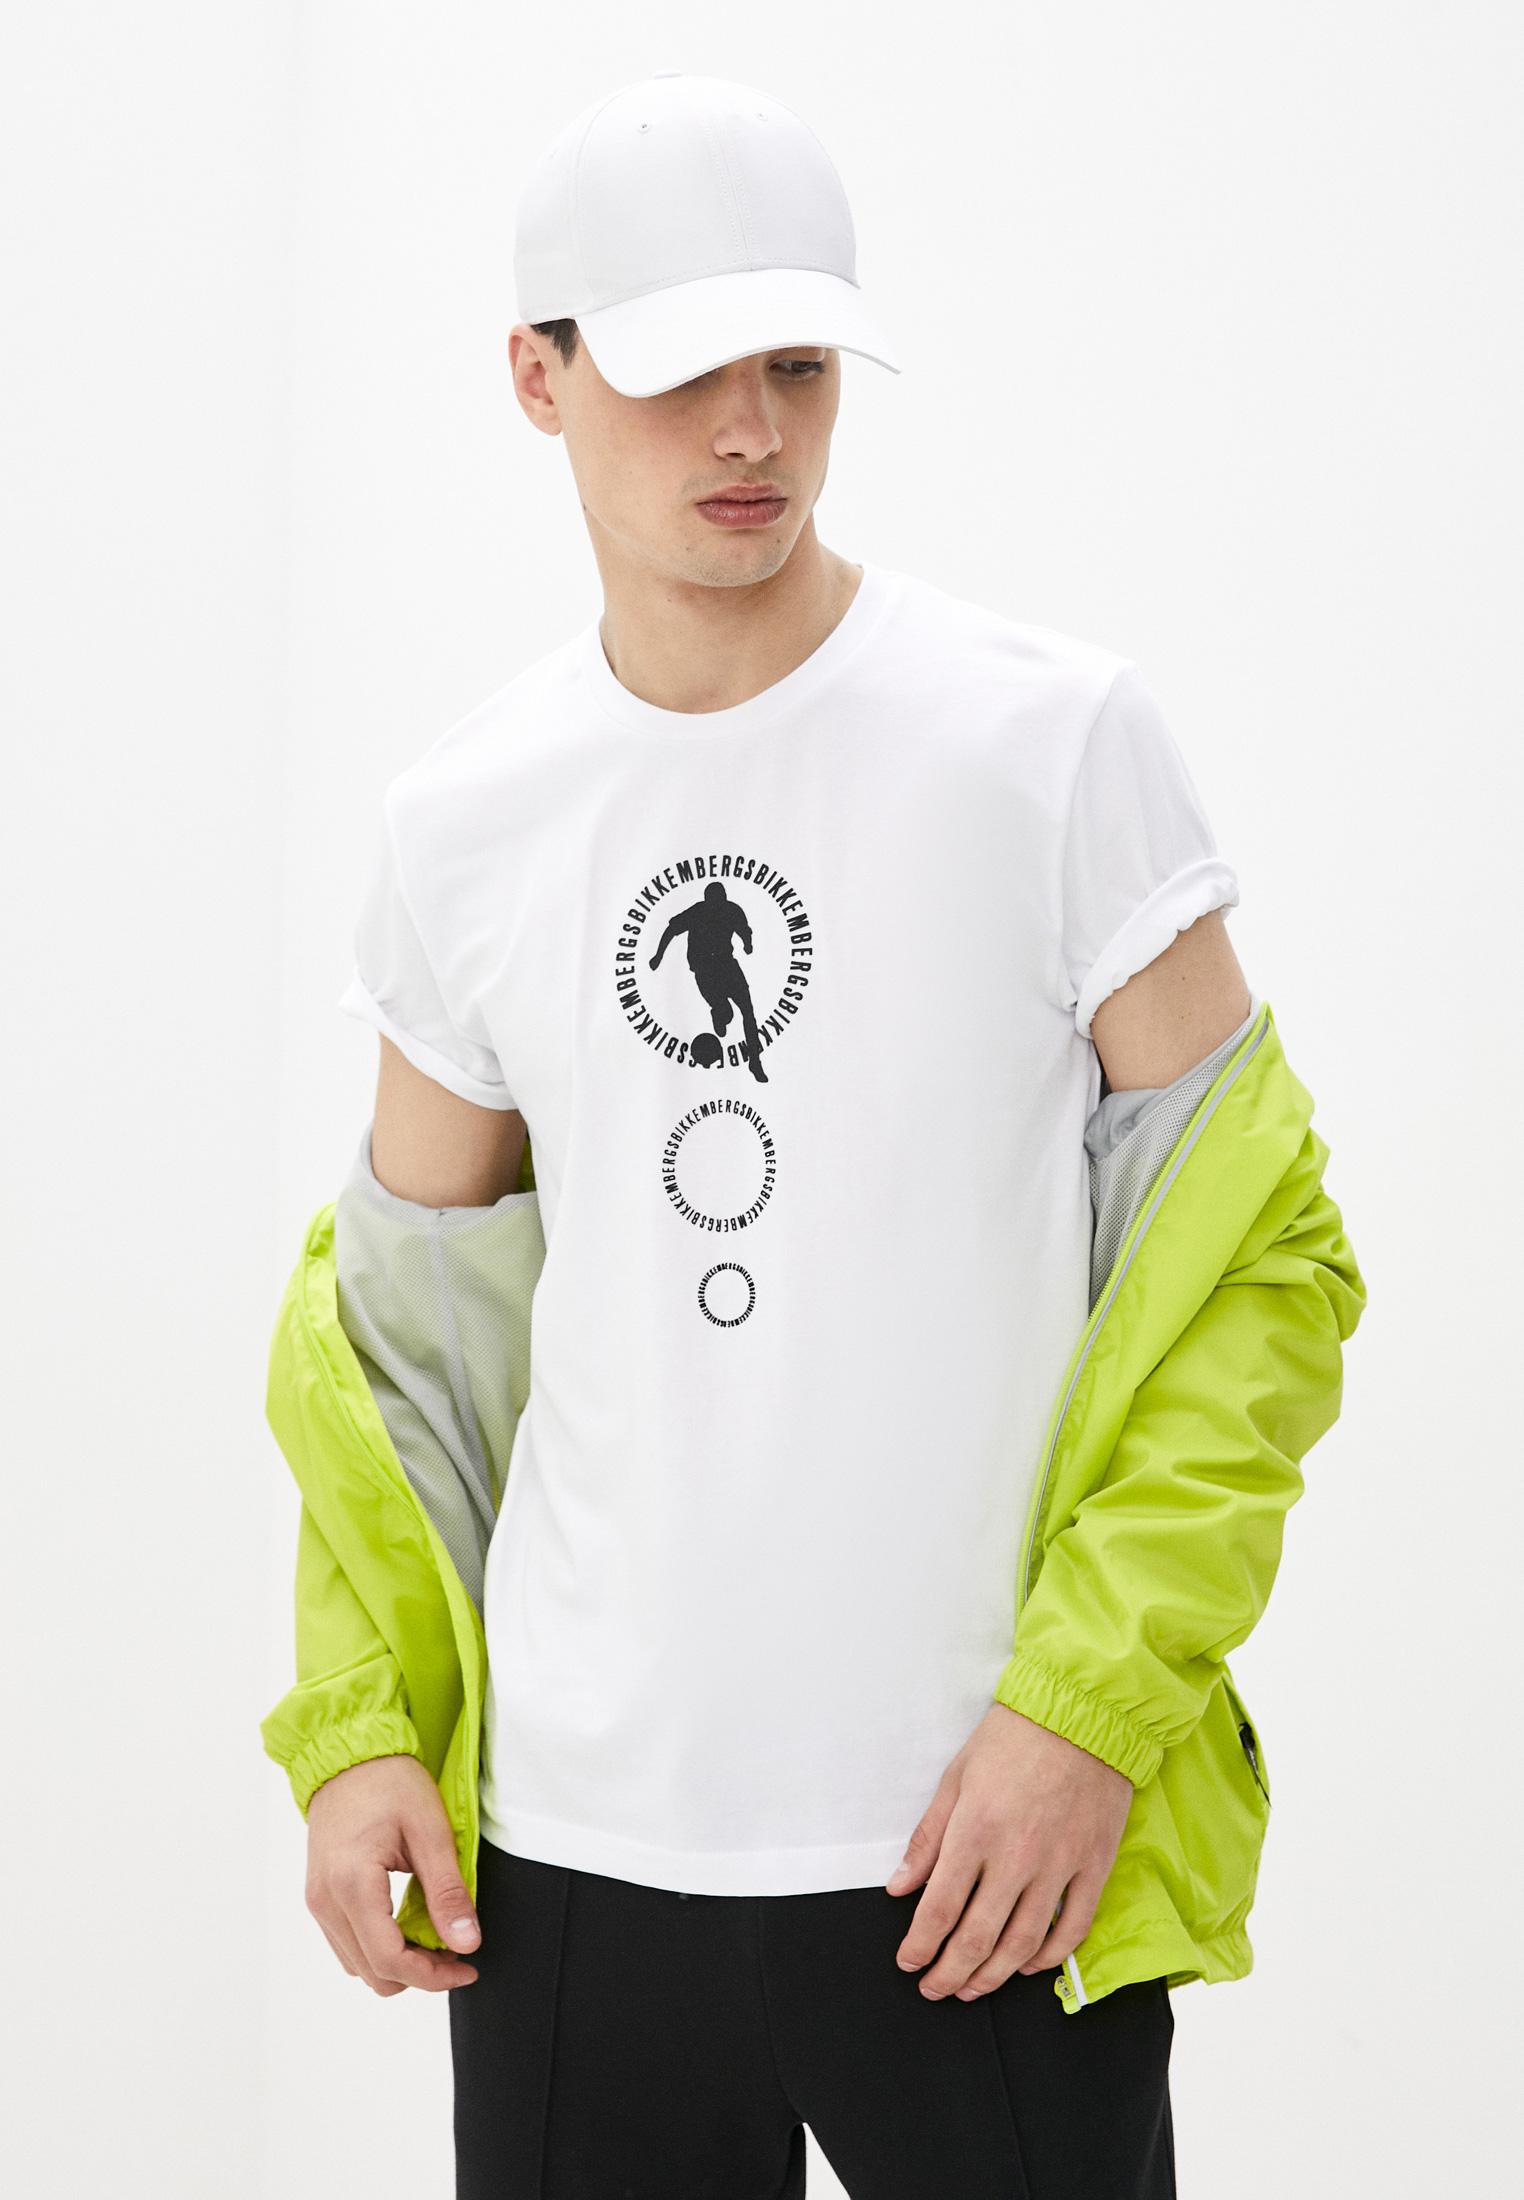 Мужская футболка Bikkembergs (Биккембергс) C 4 101 28 E 2231